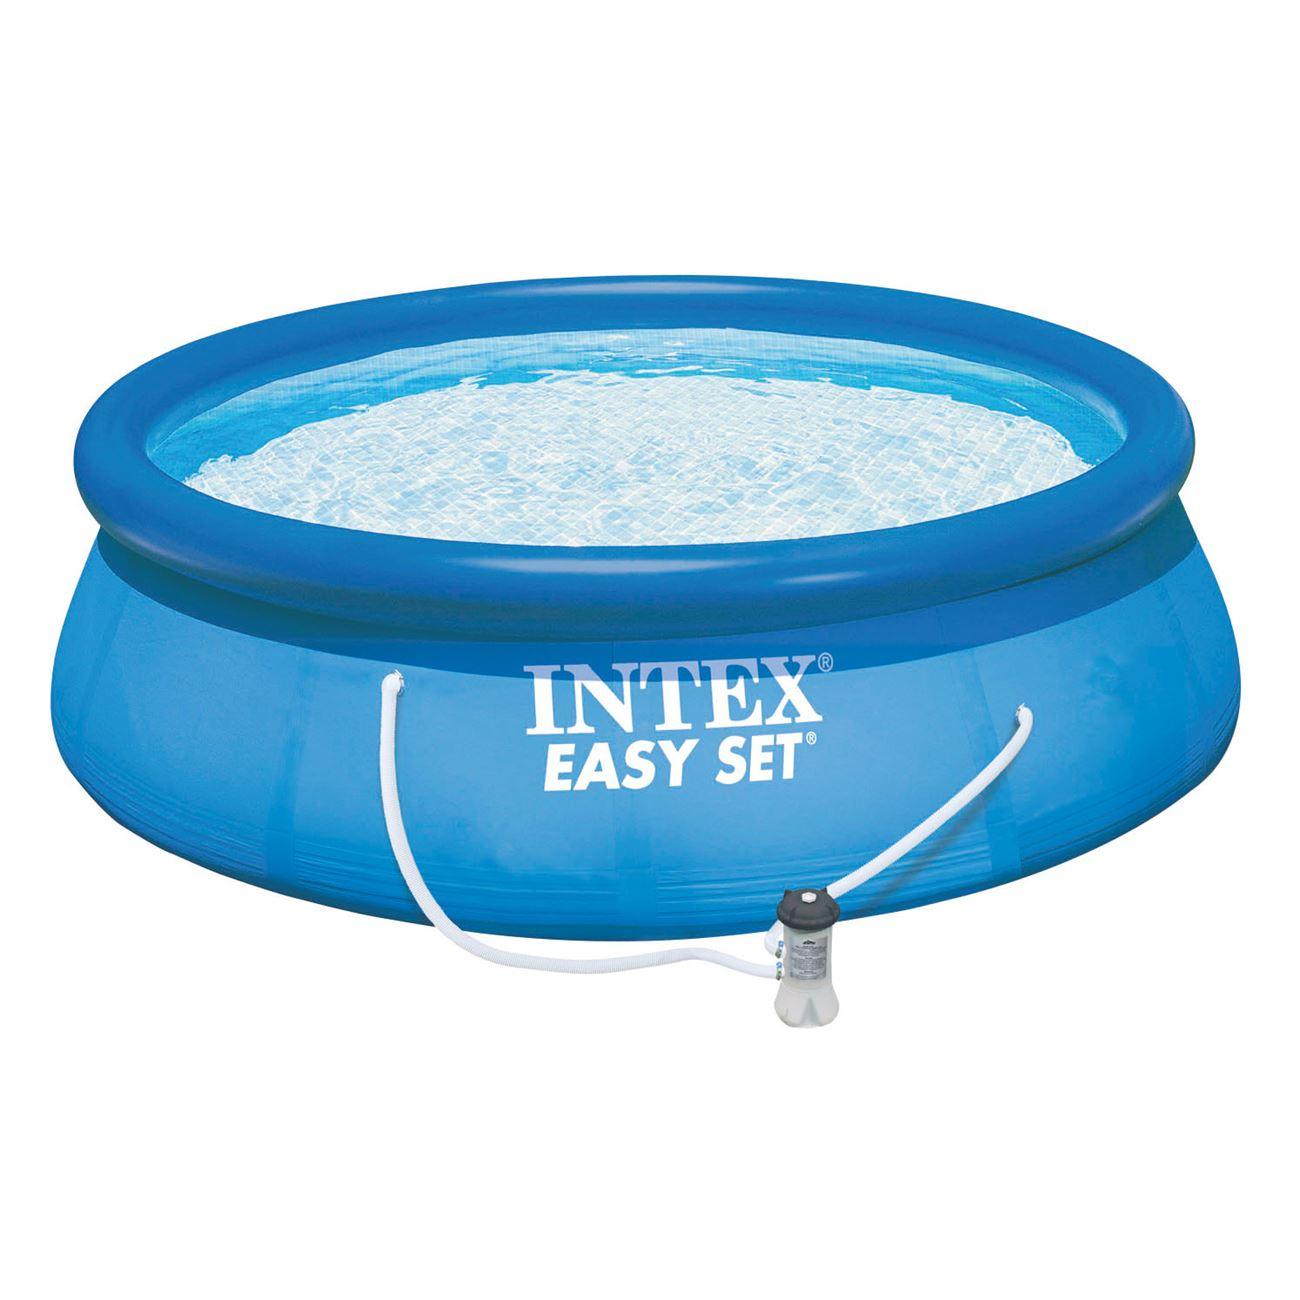 a02bb22a330 Πισίνα Easy Set με Φίλτρο 305x76 - Intex